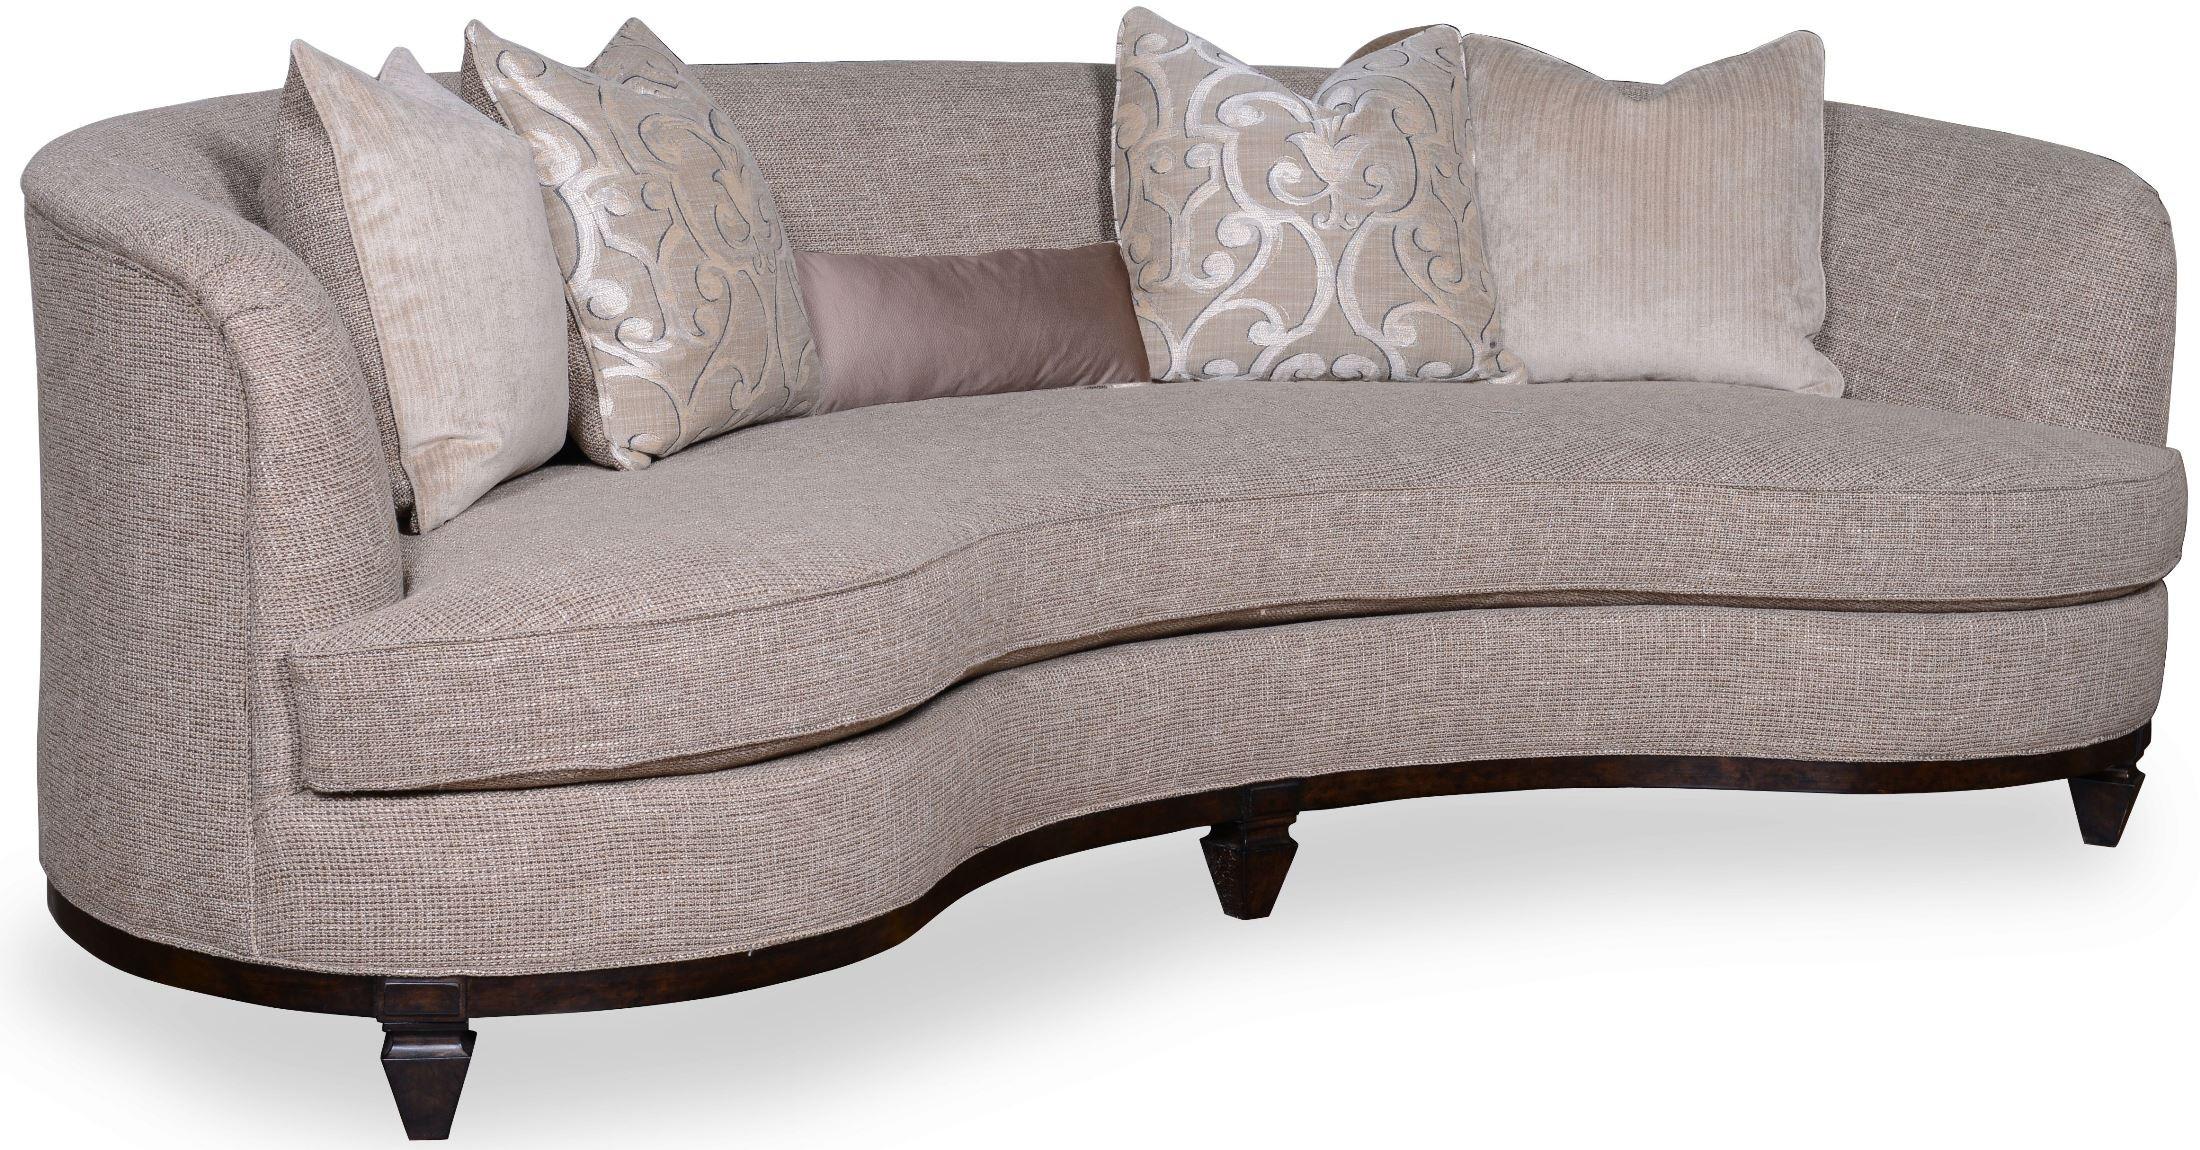 "Blair Fawn 101"" Kidney Sofa from ART 5015AA"